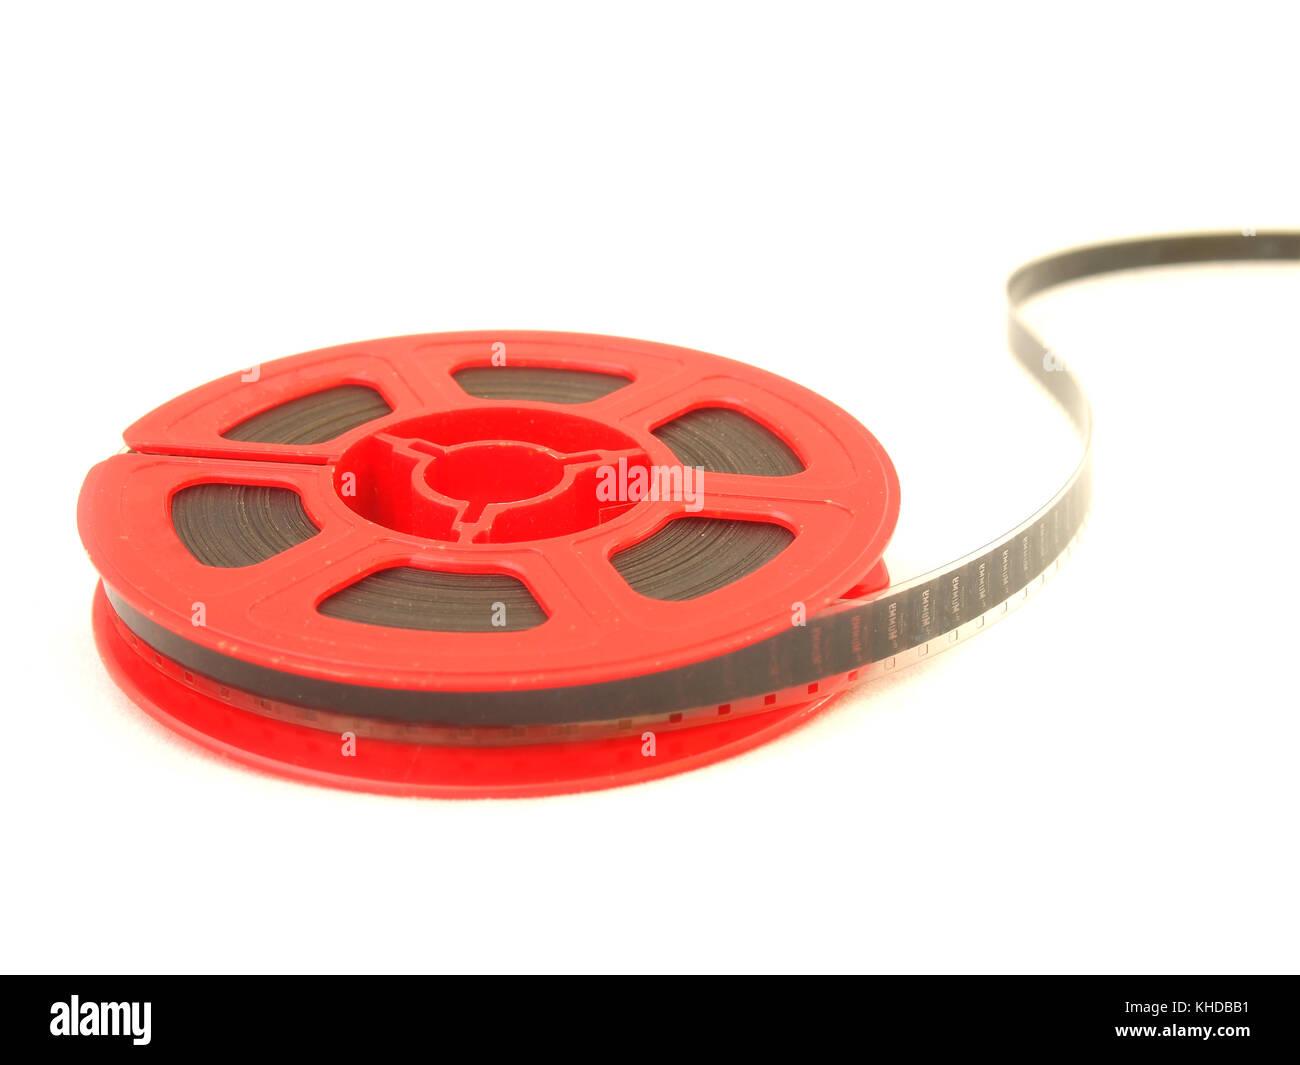 8 mm movie film reel / isolated white Stock Photo: 165636773